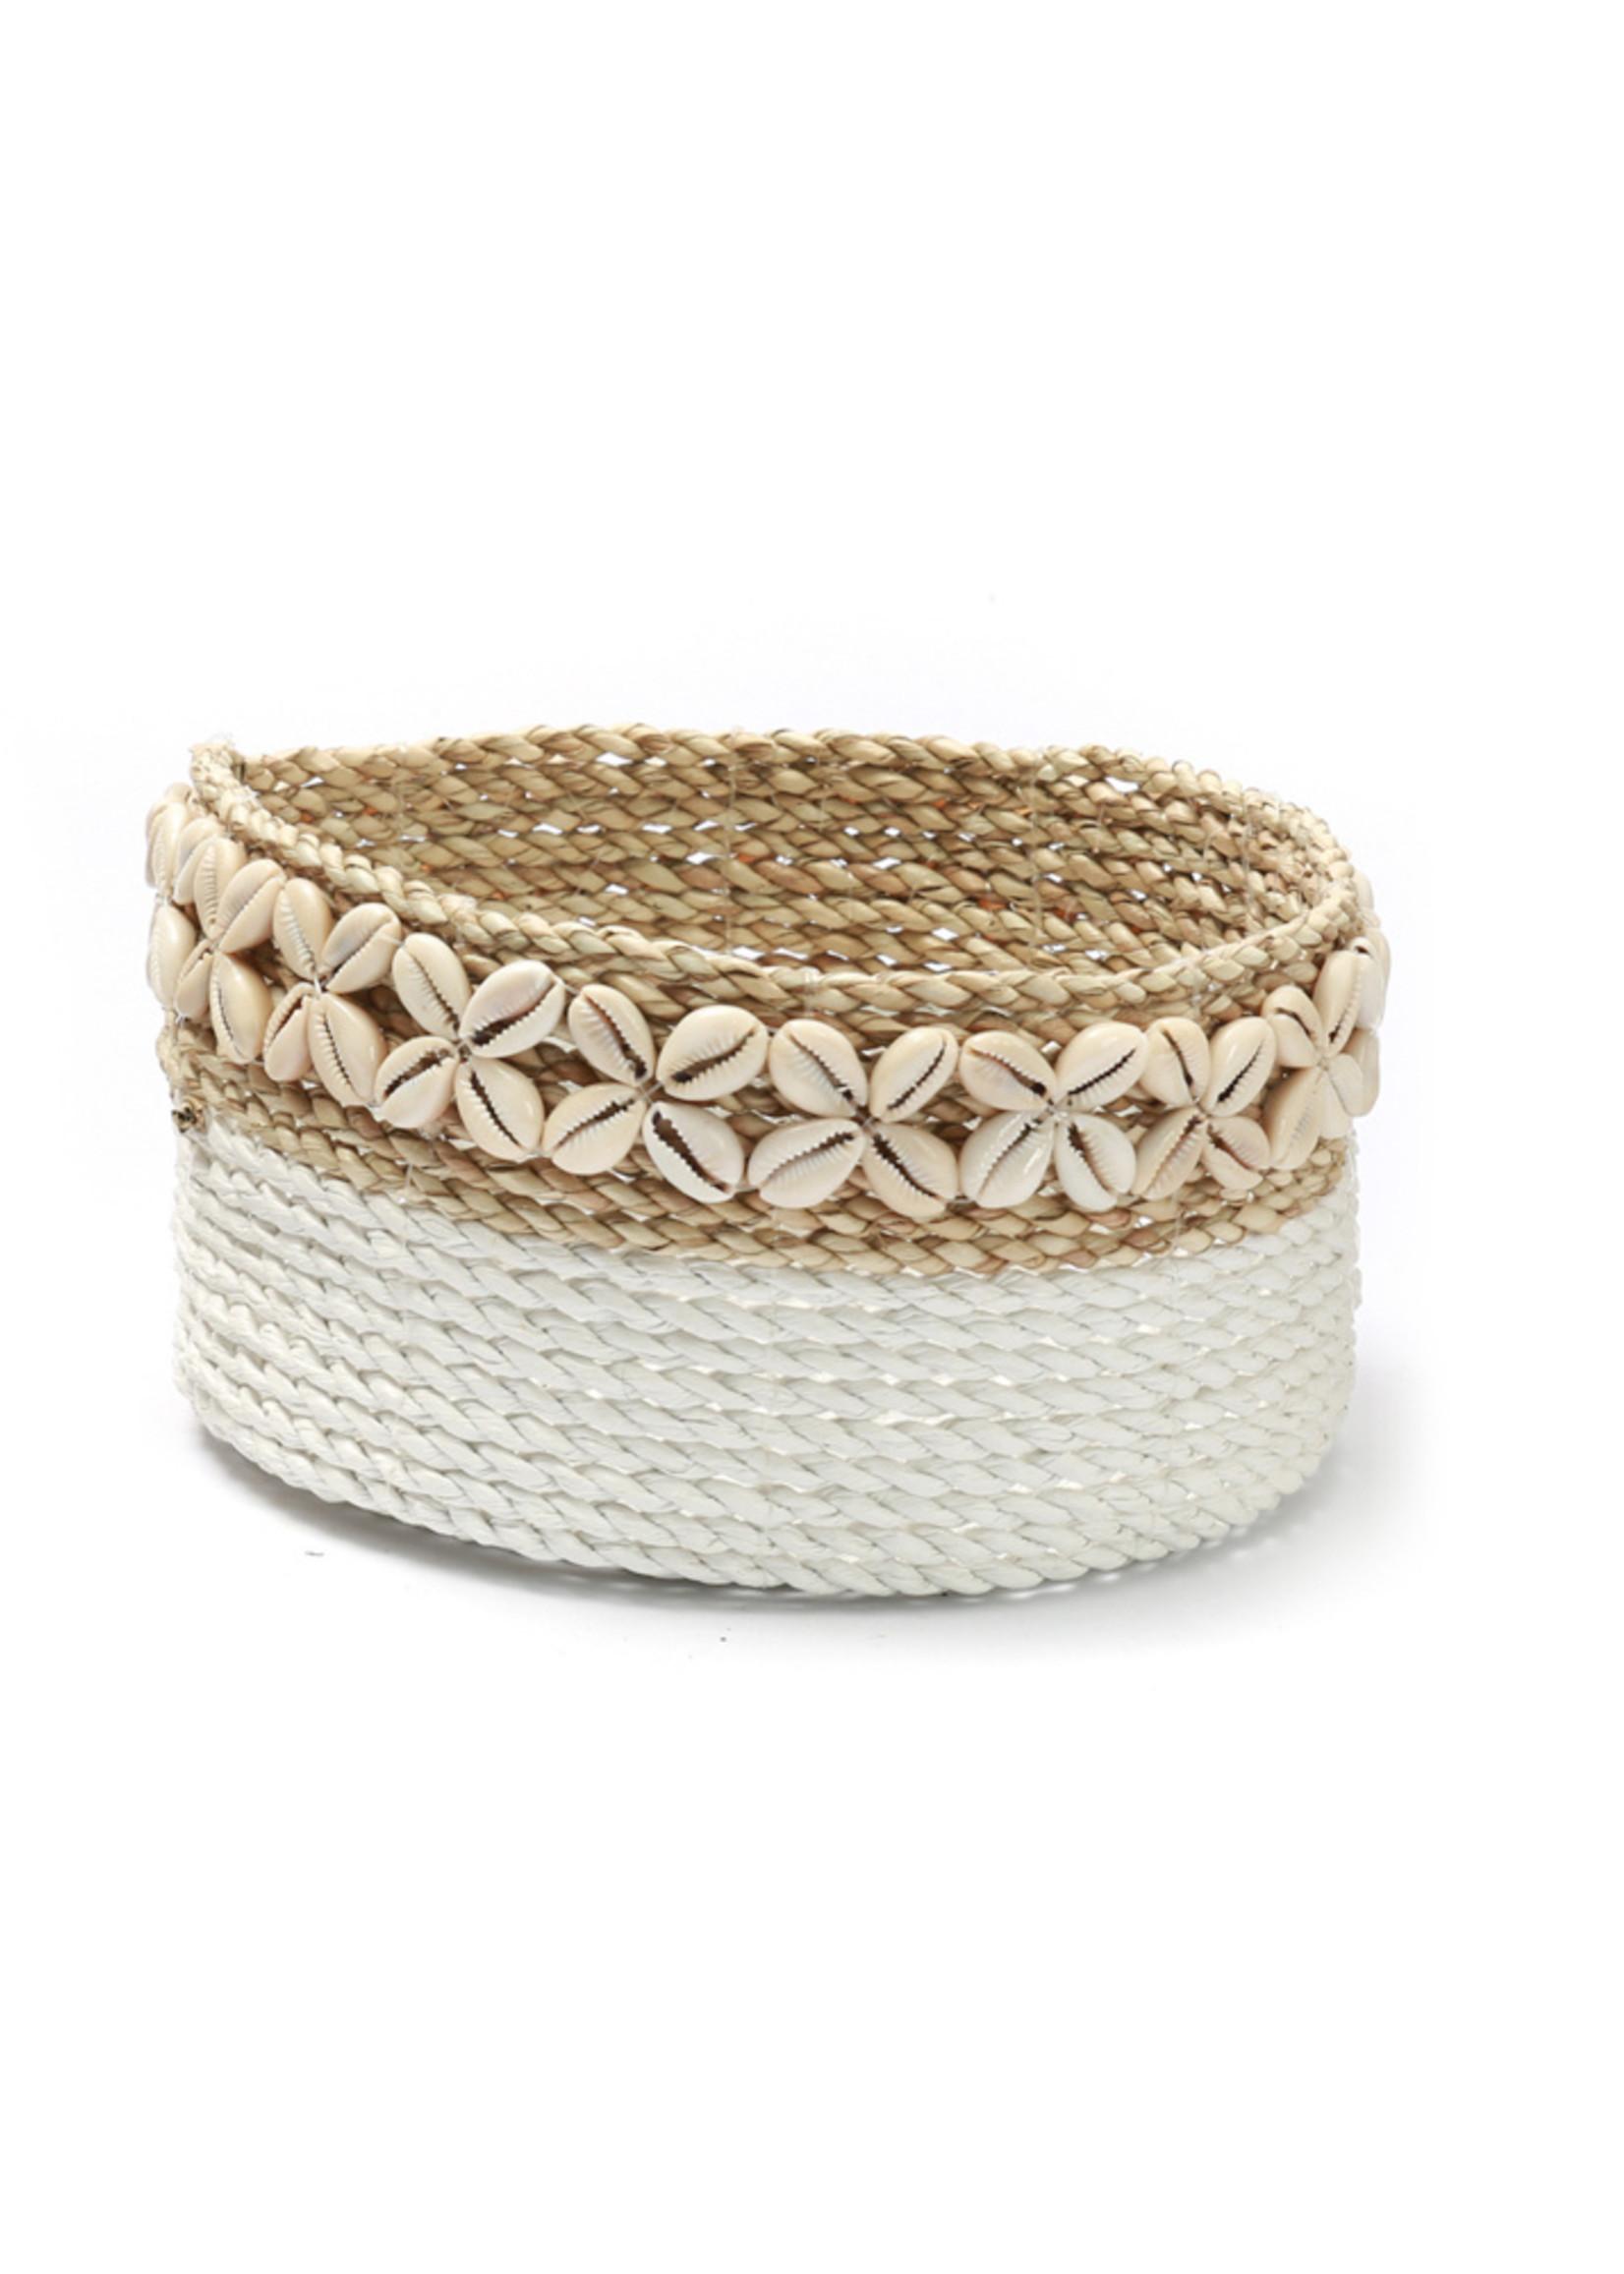 The White Sunday Baskets - White Natural - M